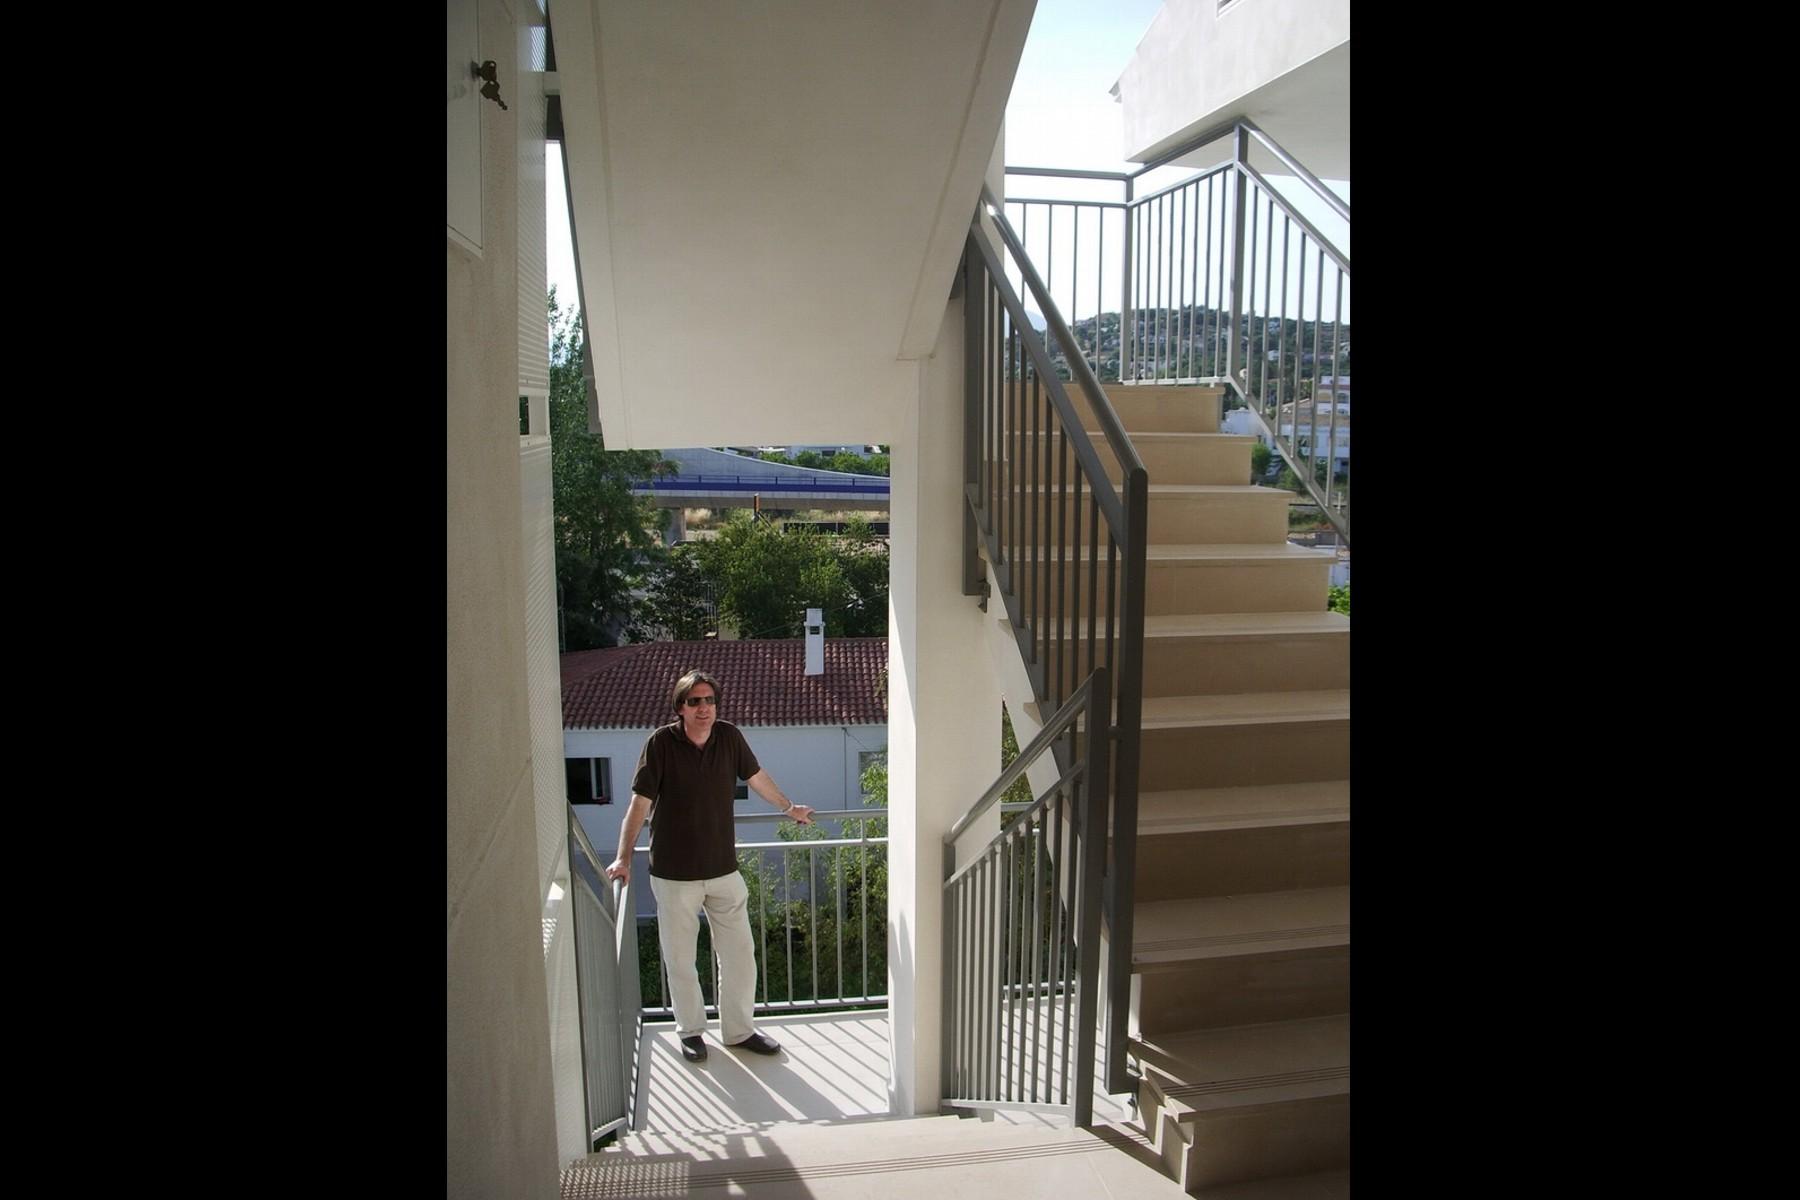 Imaginarq-155-Edificio-Viviendas-Altea-Alicante-40A